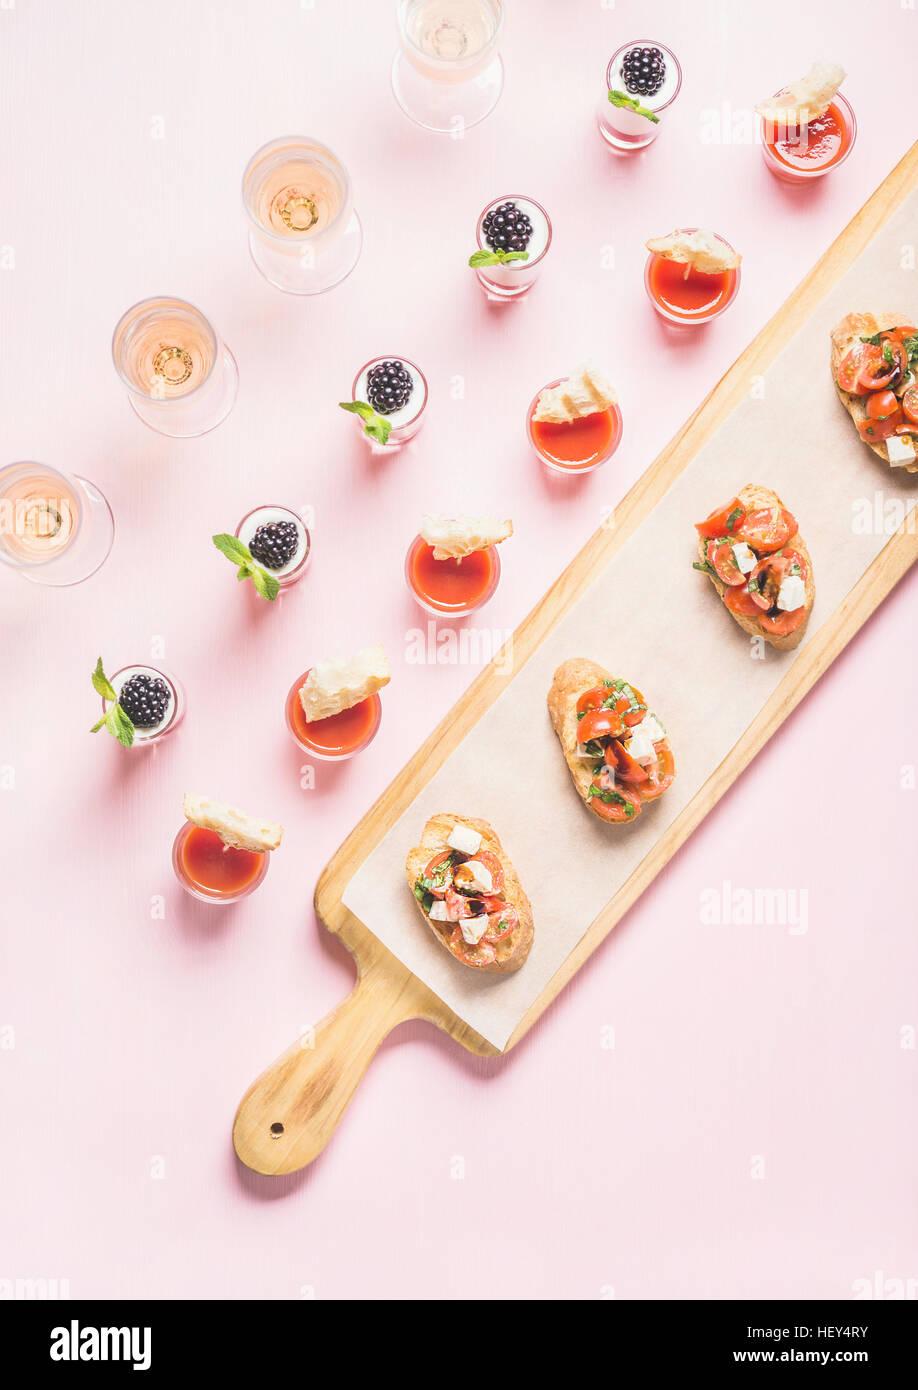 Brushetta Sandwiches, Gazpacho Aufnahmen, Snacks, Desserts in Pastell rosa Hintergrund Stockbild